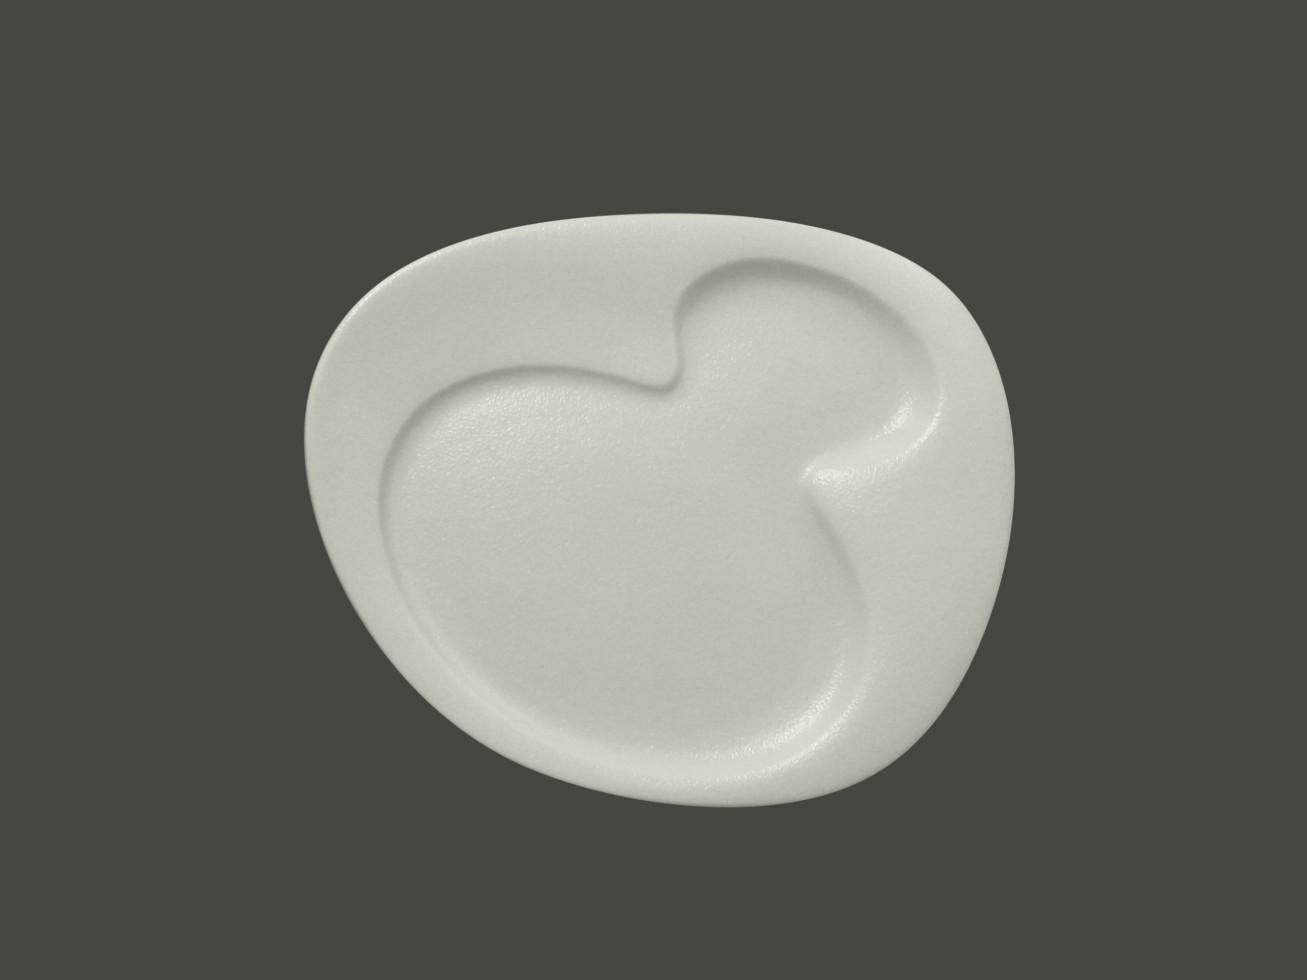 Breakfast talíř - 2 basins - bílá Neofusion